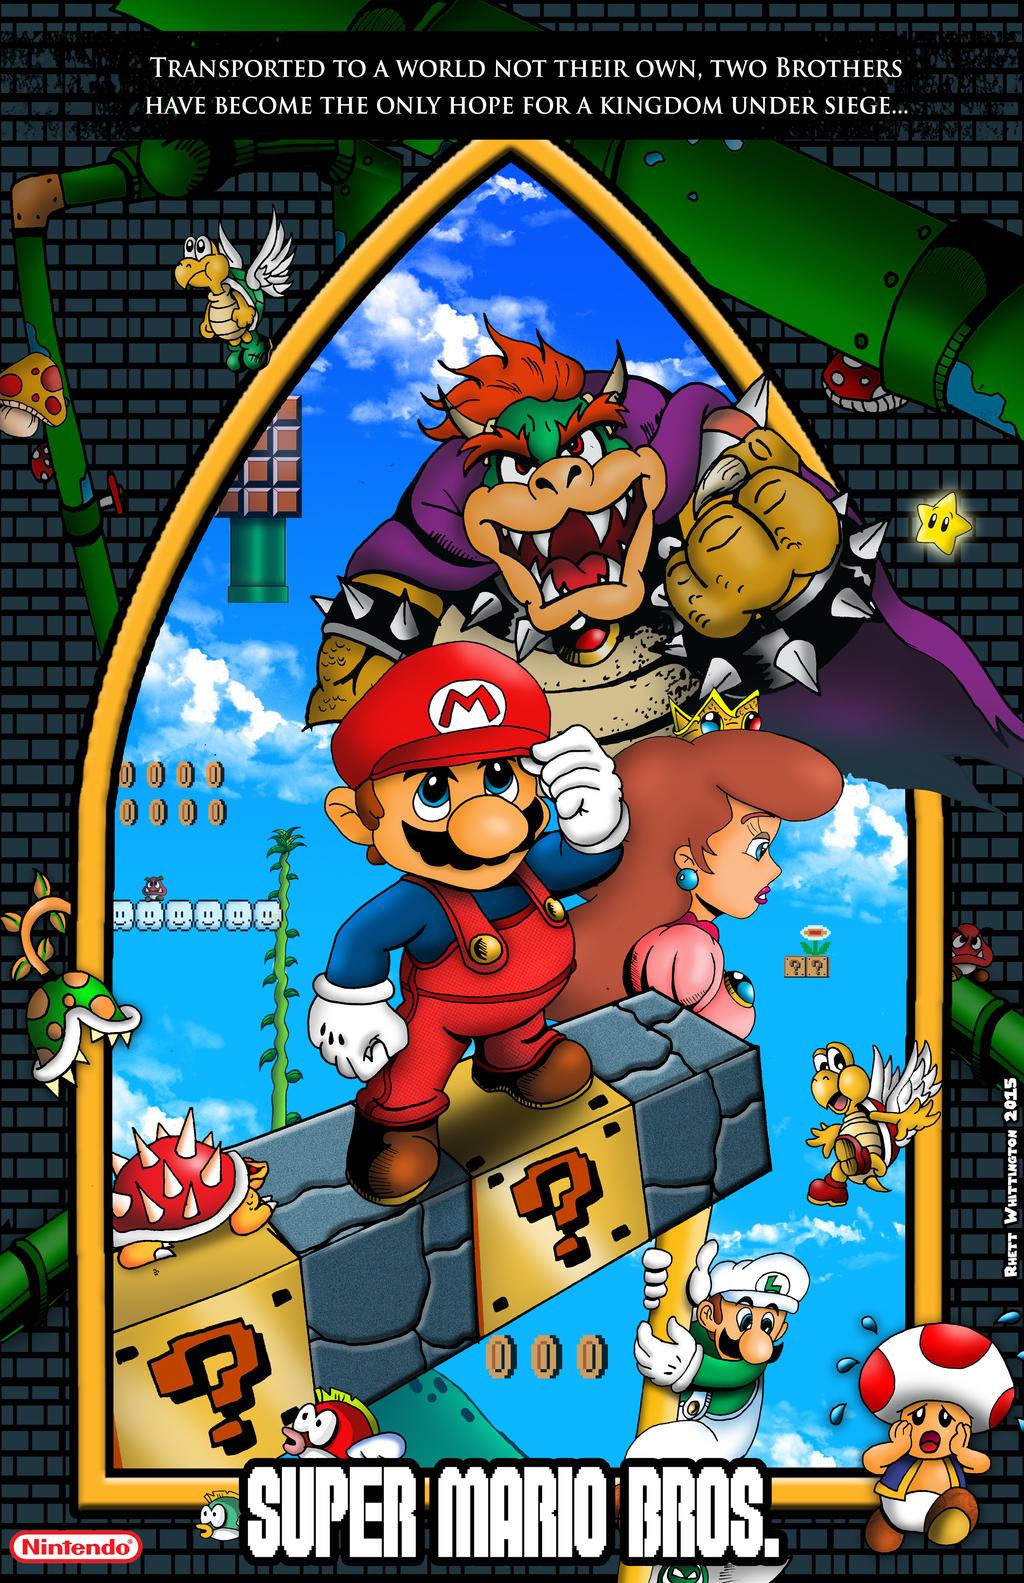 Super Mario Bros Poster By Whittingtonrhett On Deviantart